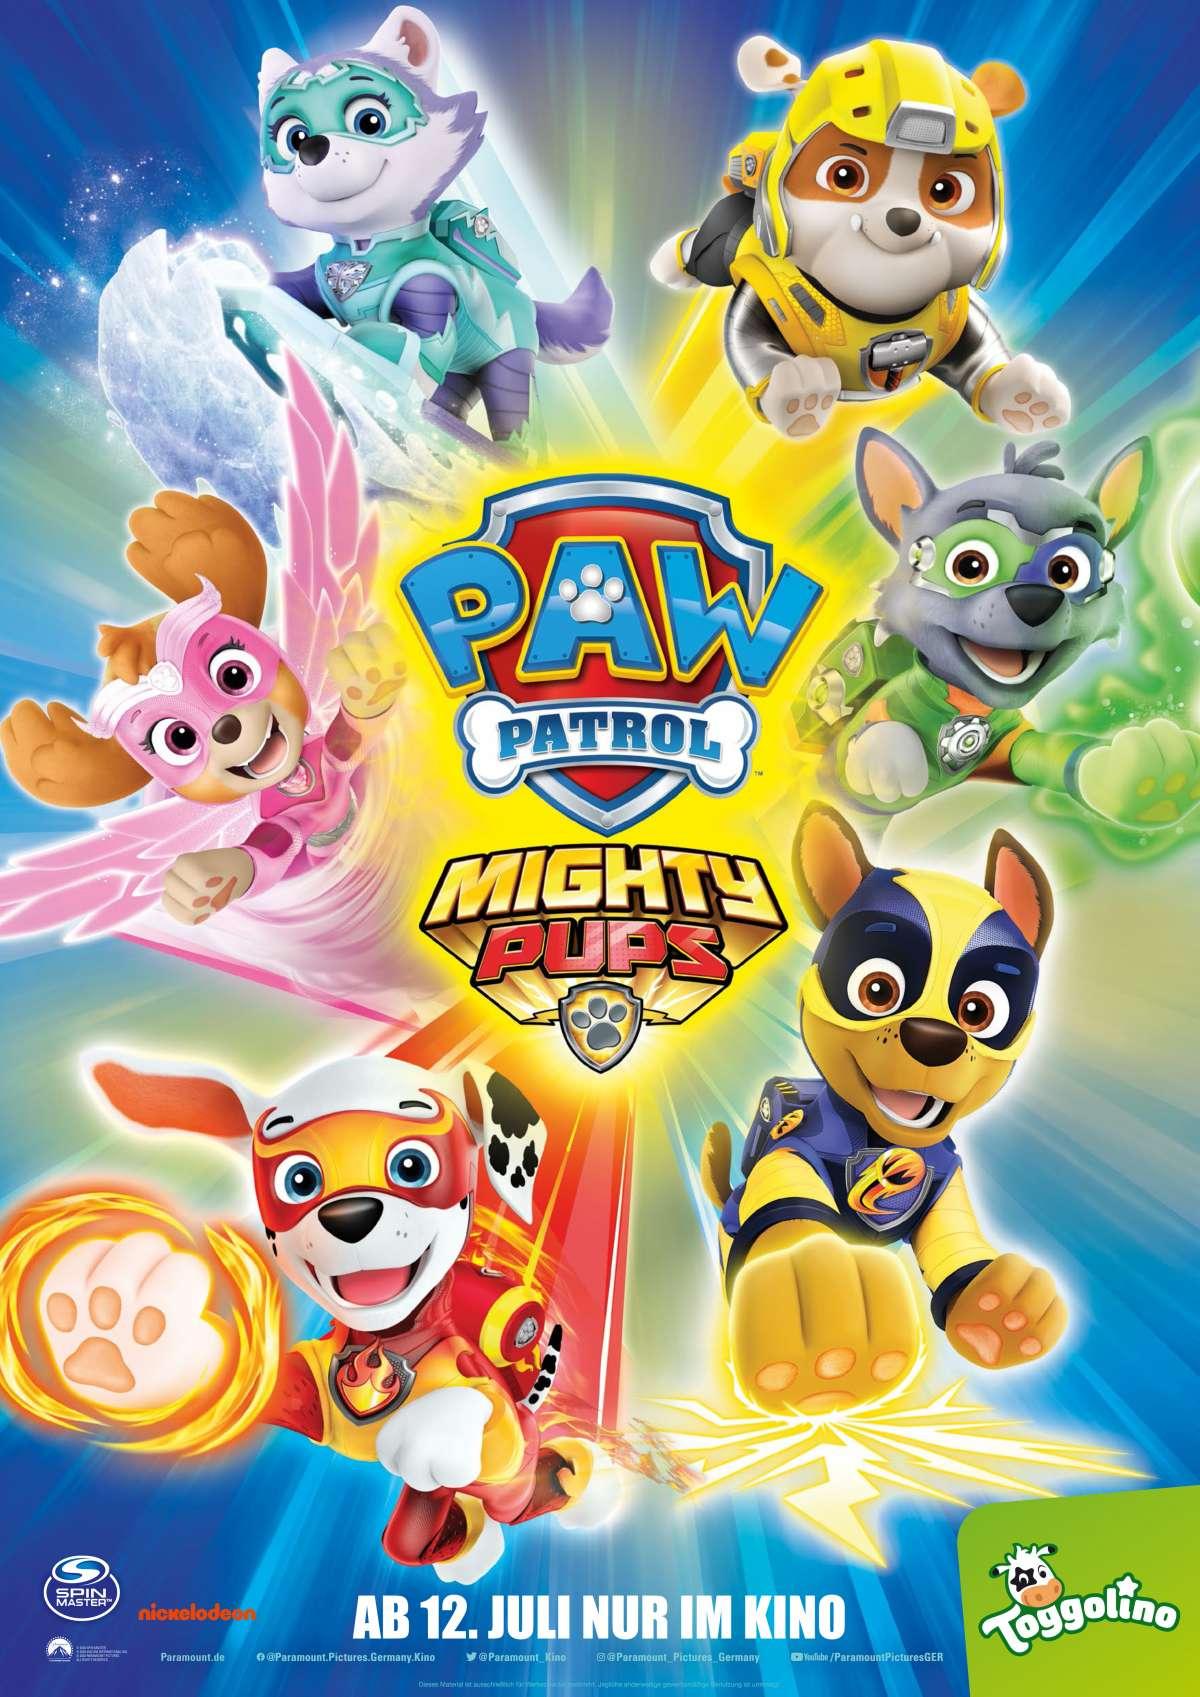 Paw Patrol: Mighty Pups - Cineplex  - Baunatal